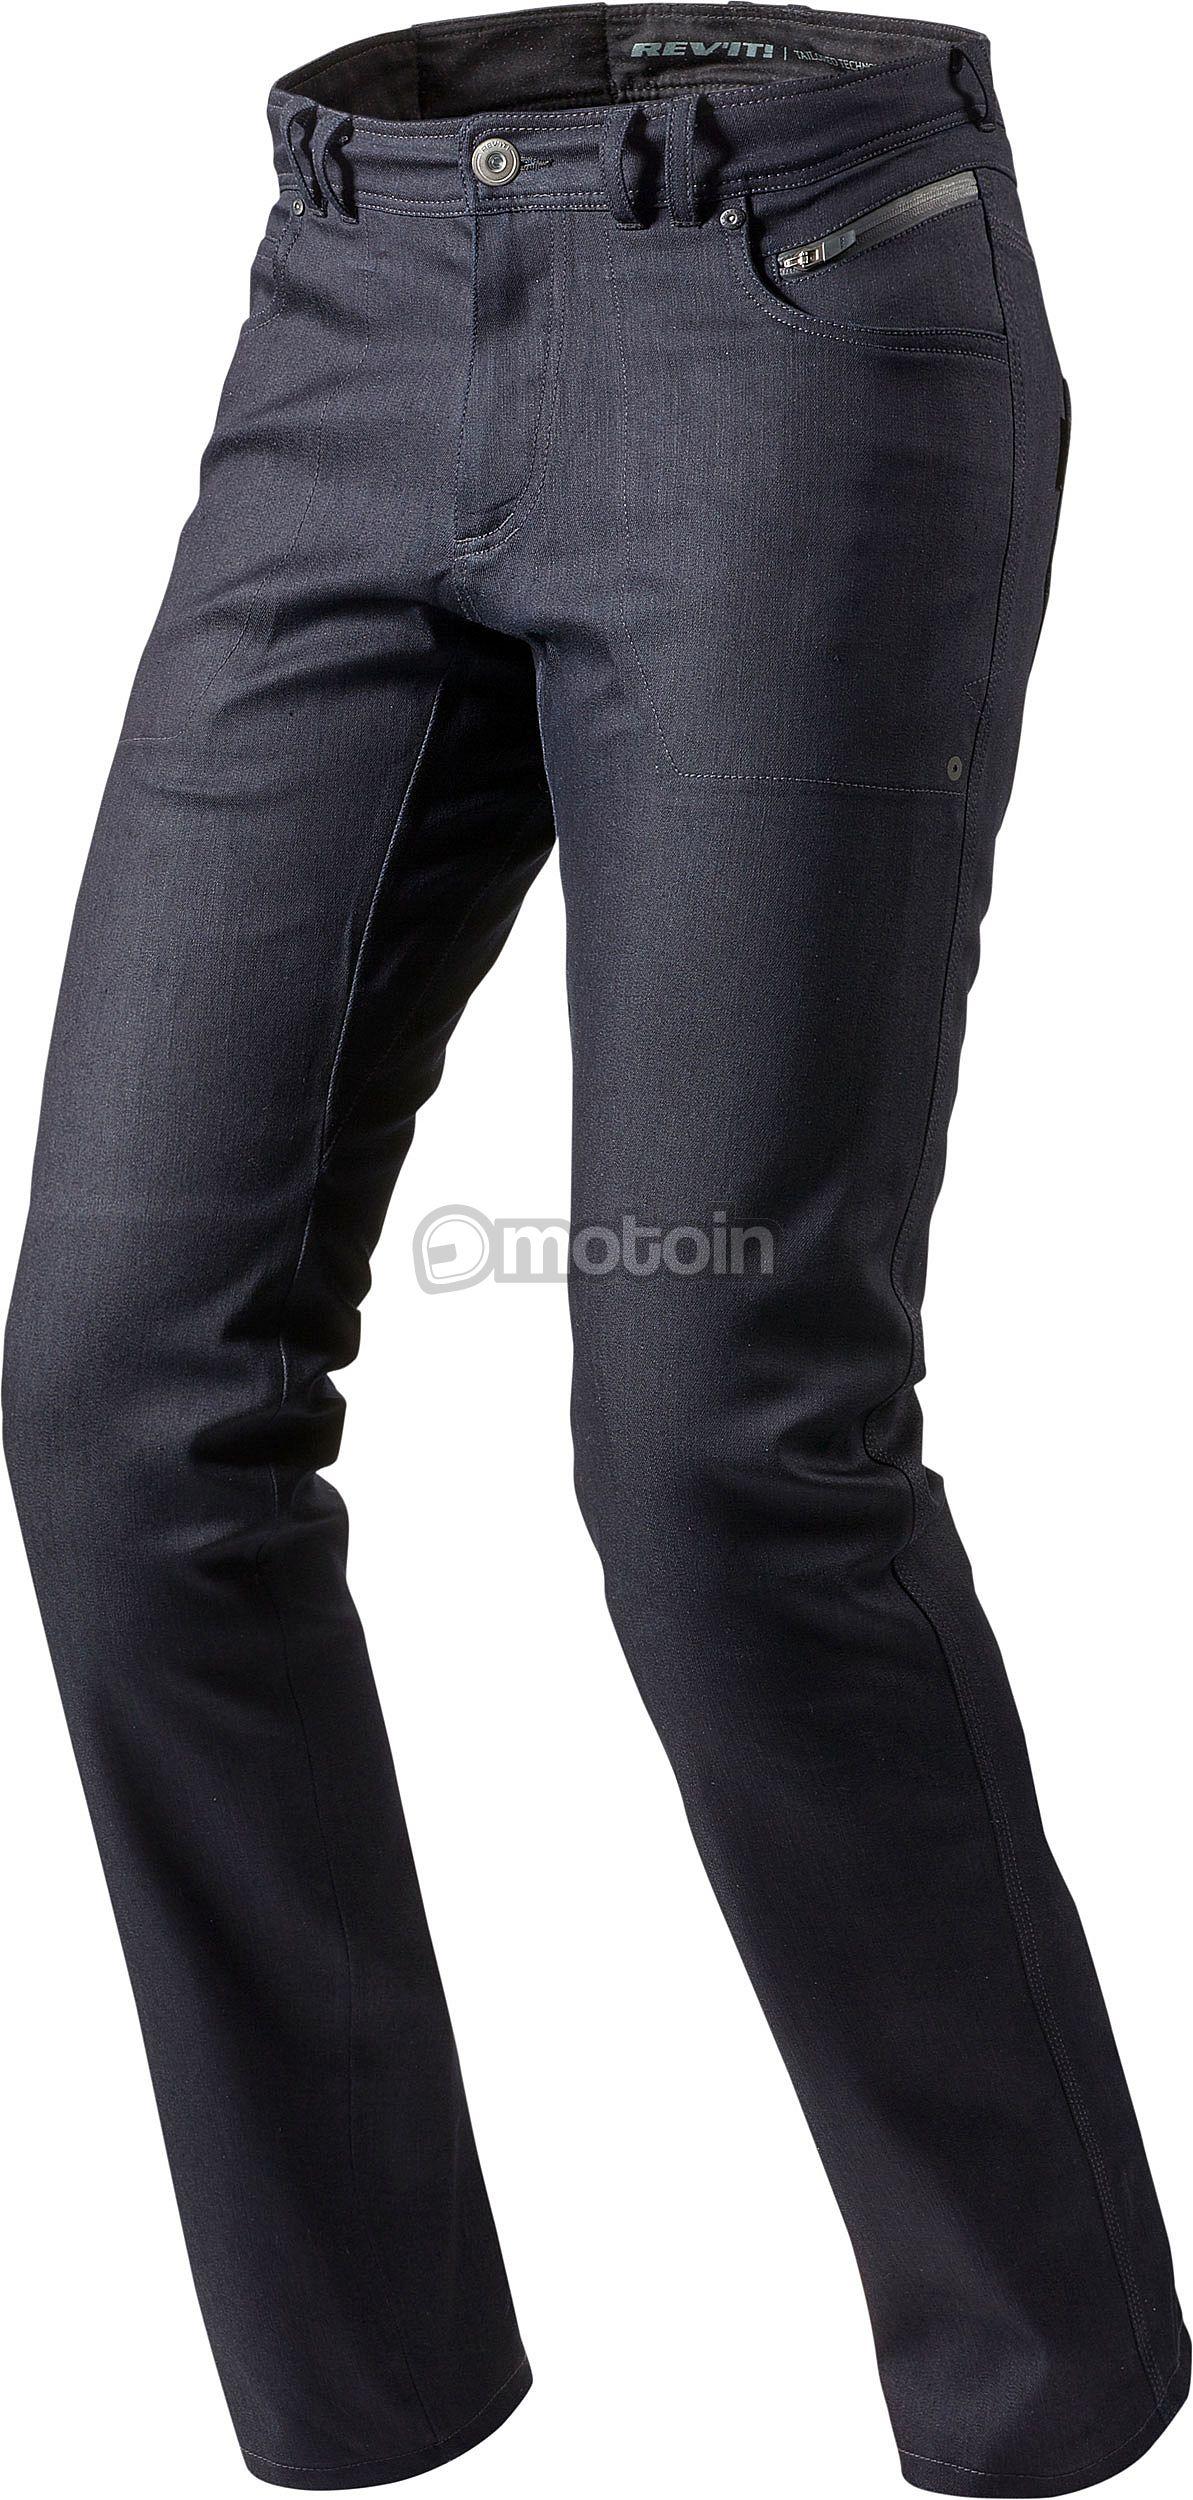 revit orlando h2o jeans wasserdicht. Black Bedroom Furniture Sets. Home Design Ideas